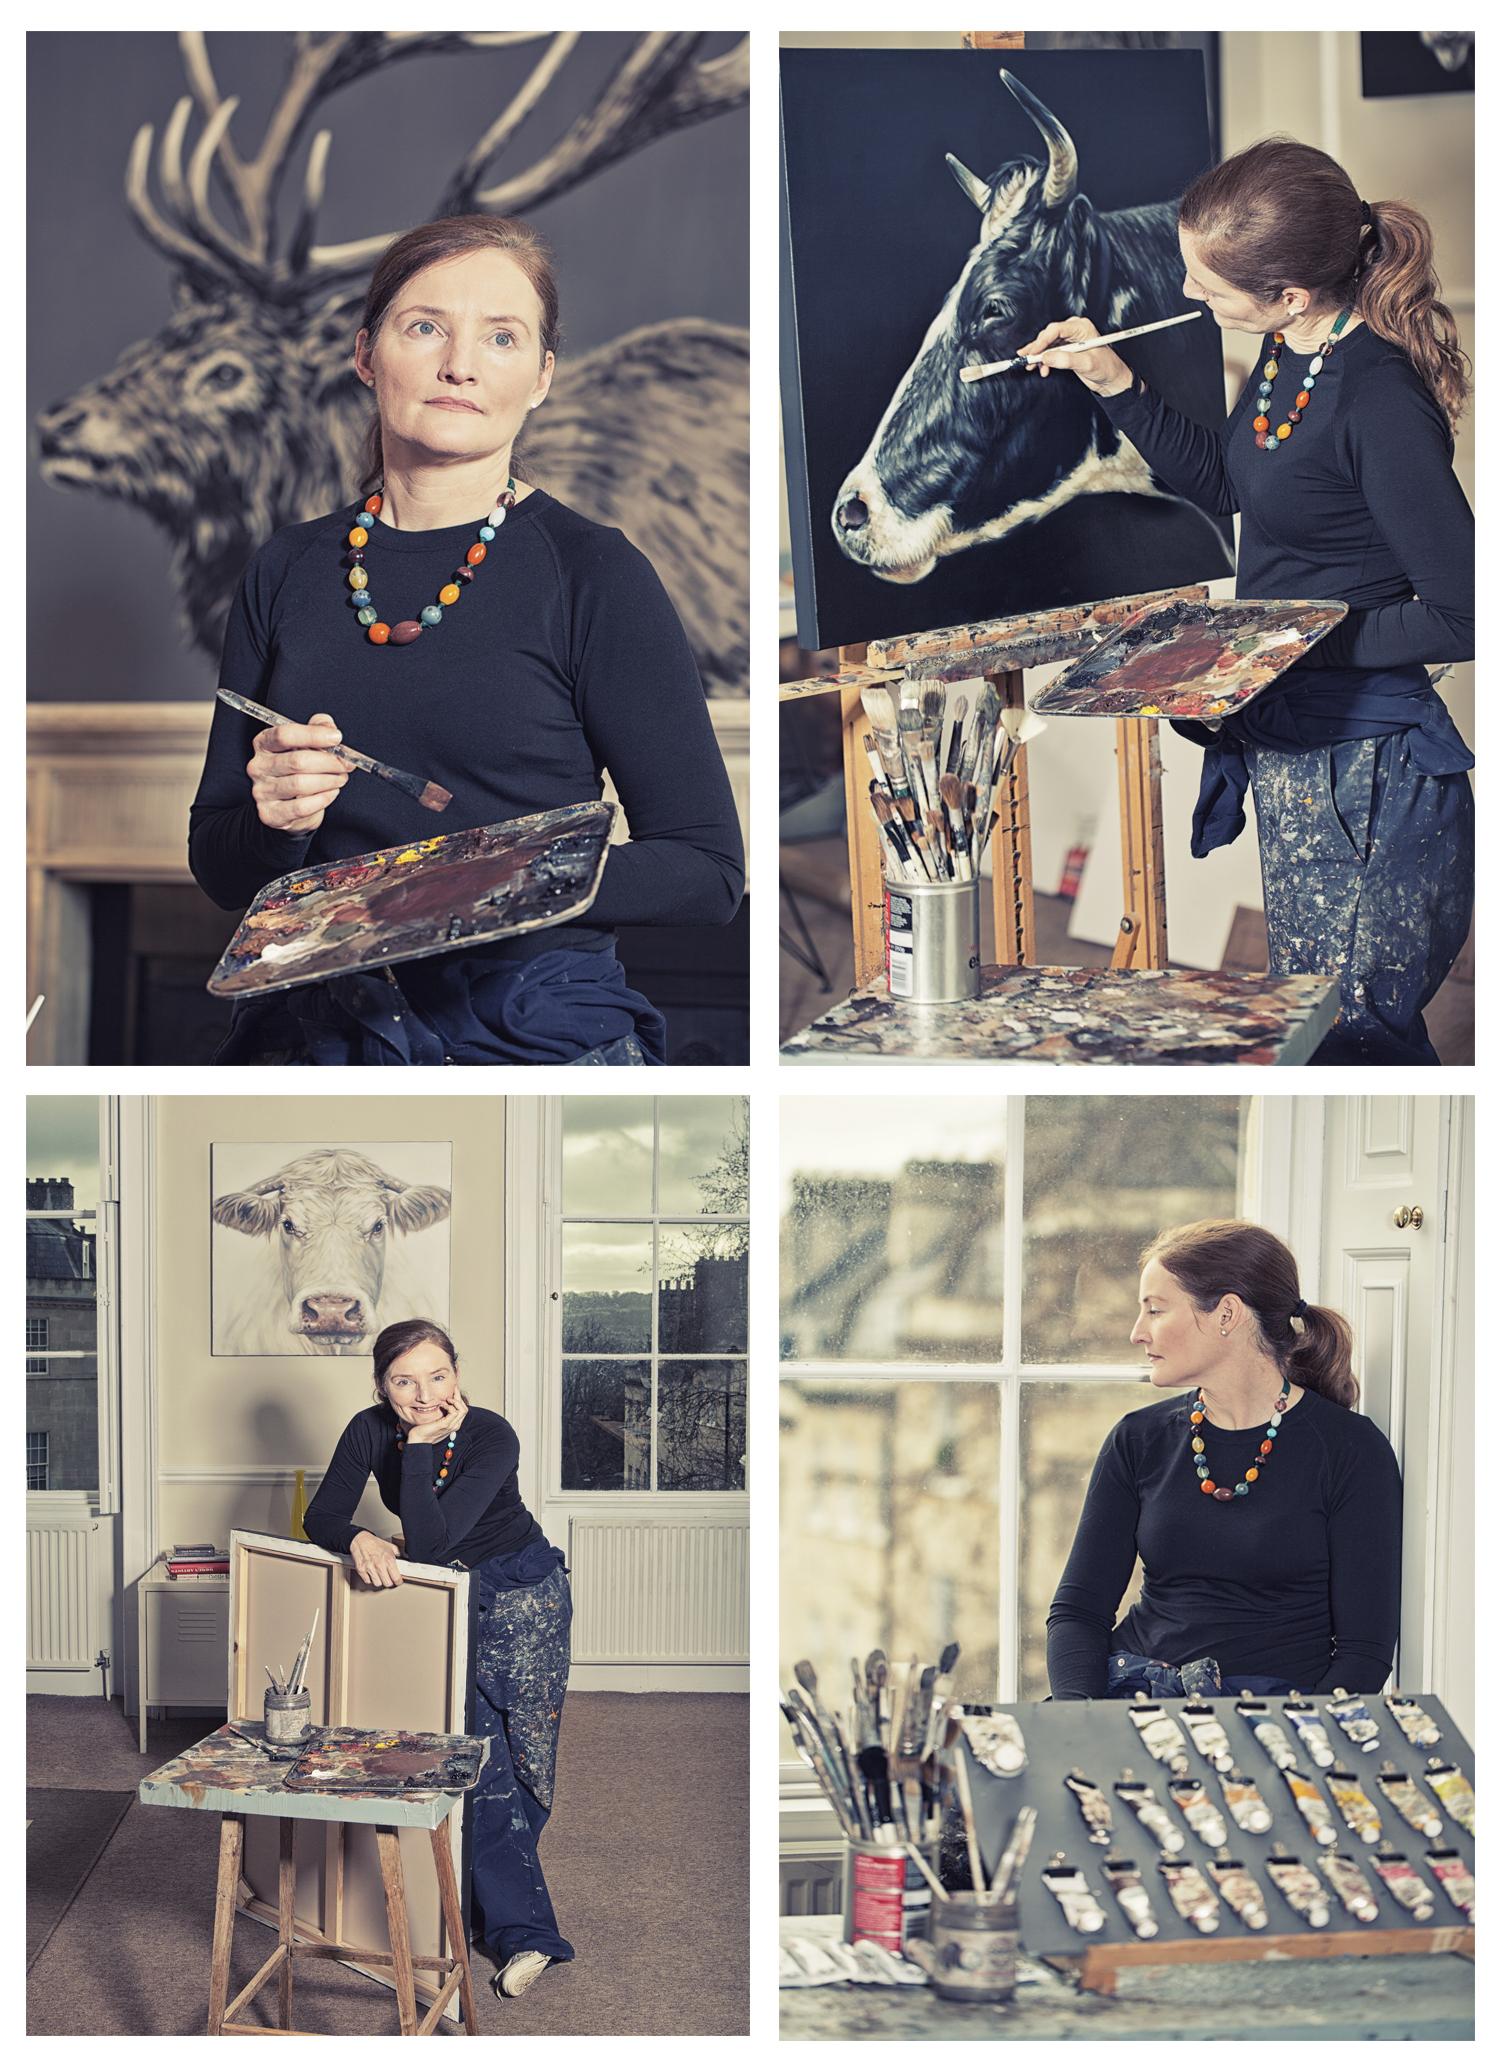 Joanne Cope in her studio